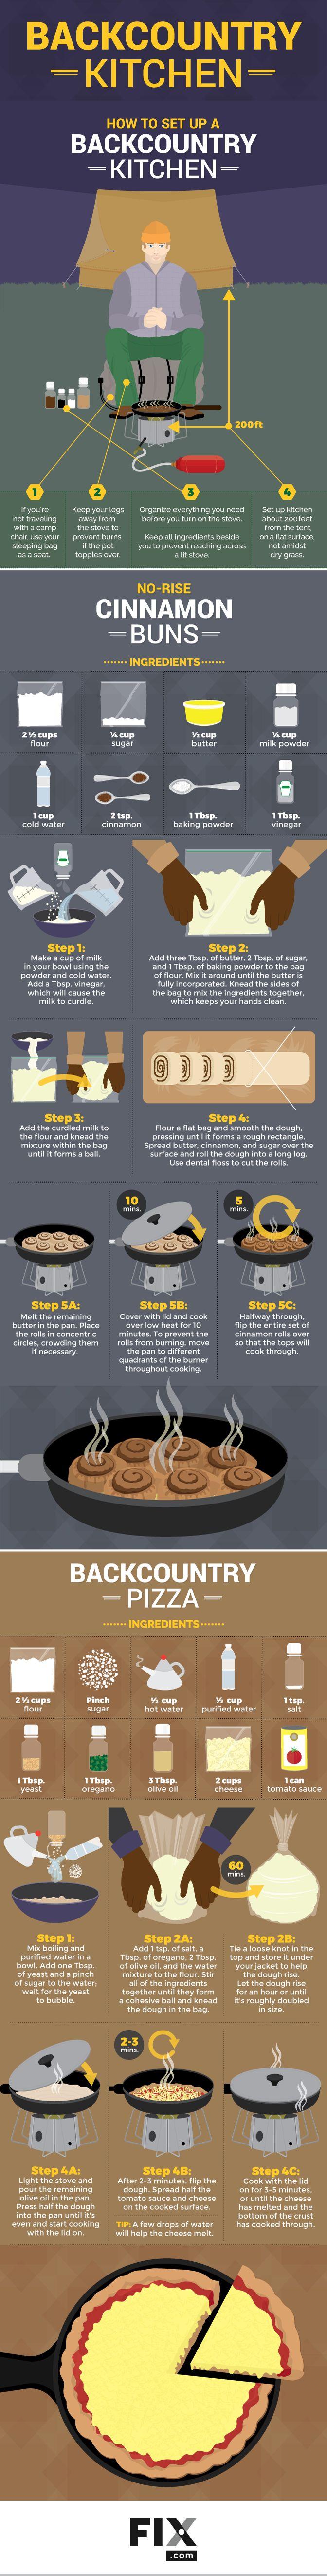 Easy hiking food recipes